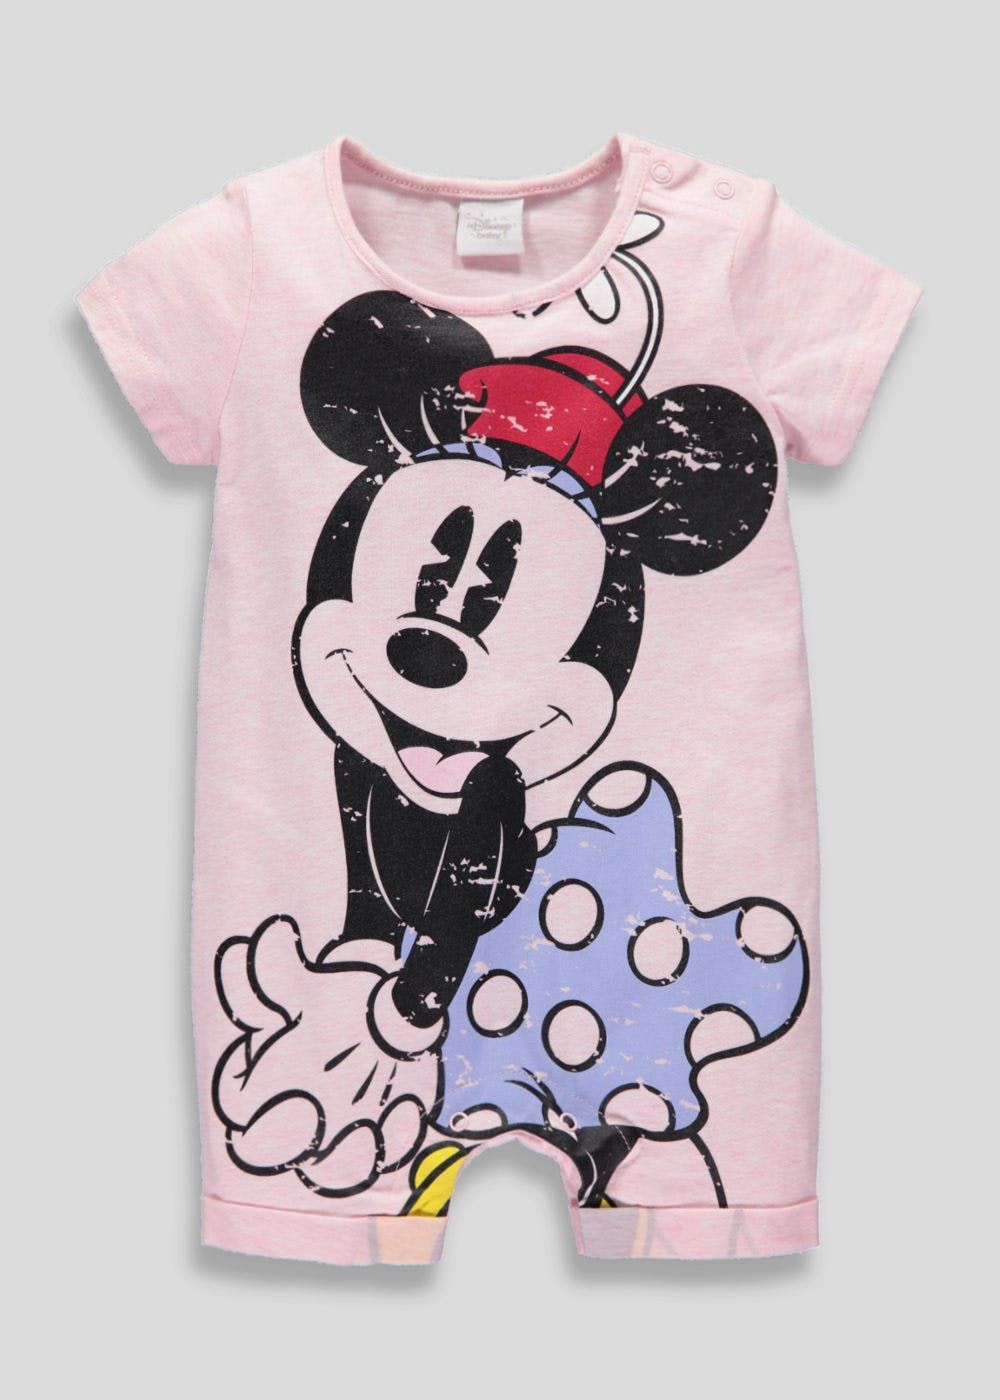 6a620f9a3 Kids Disney Minnie Mouse Romper (Newborn-12mths) | Pastel Clothes ...